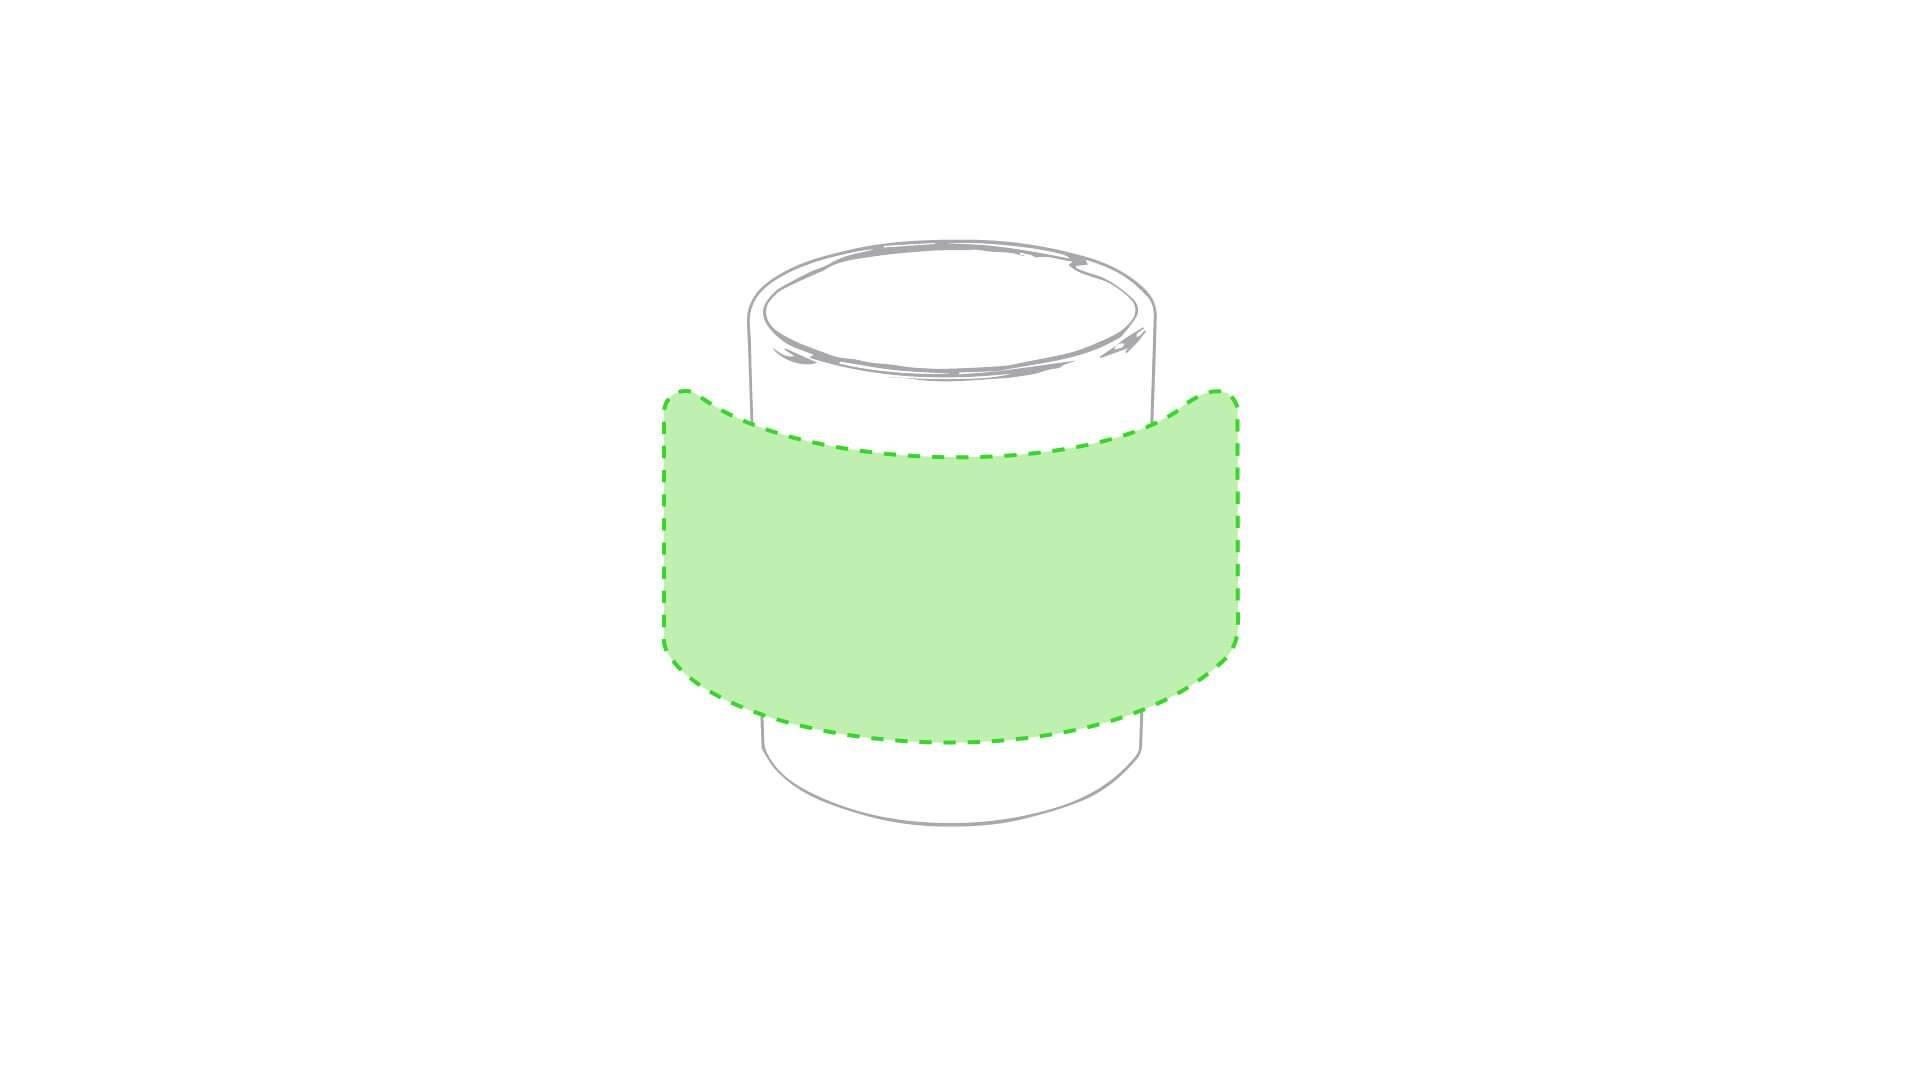 Taza cerámica blanca para engraving 1